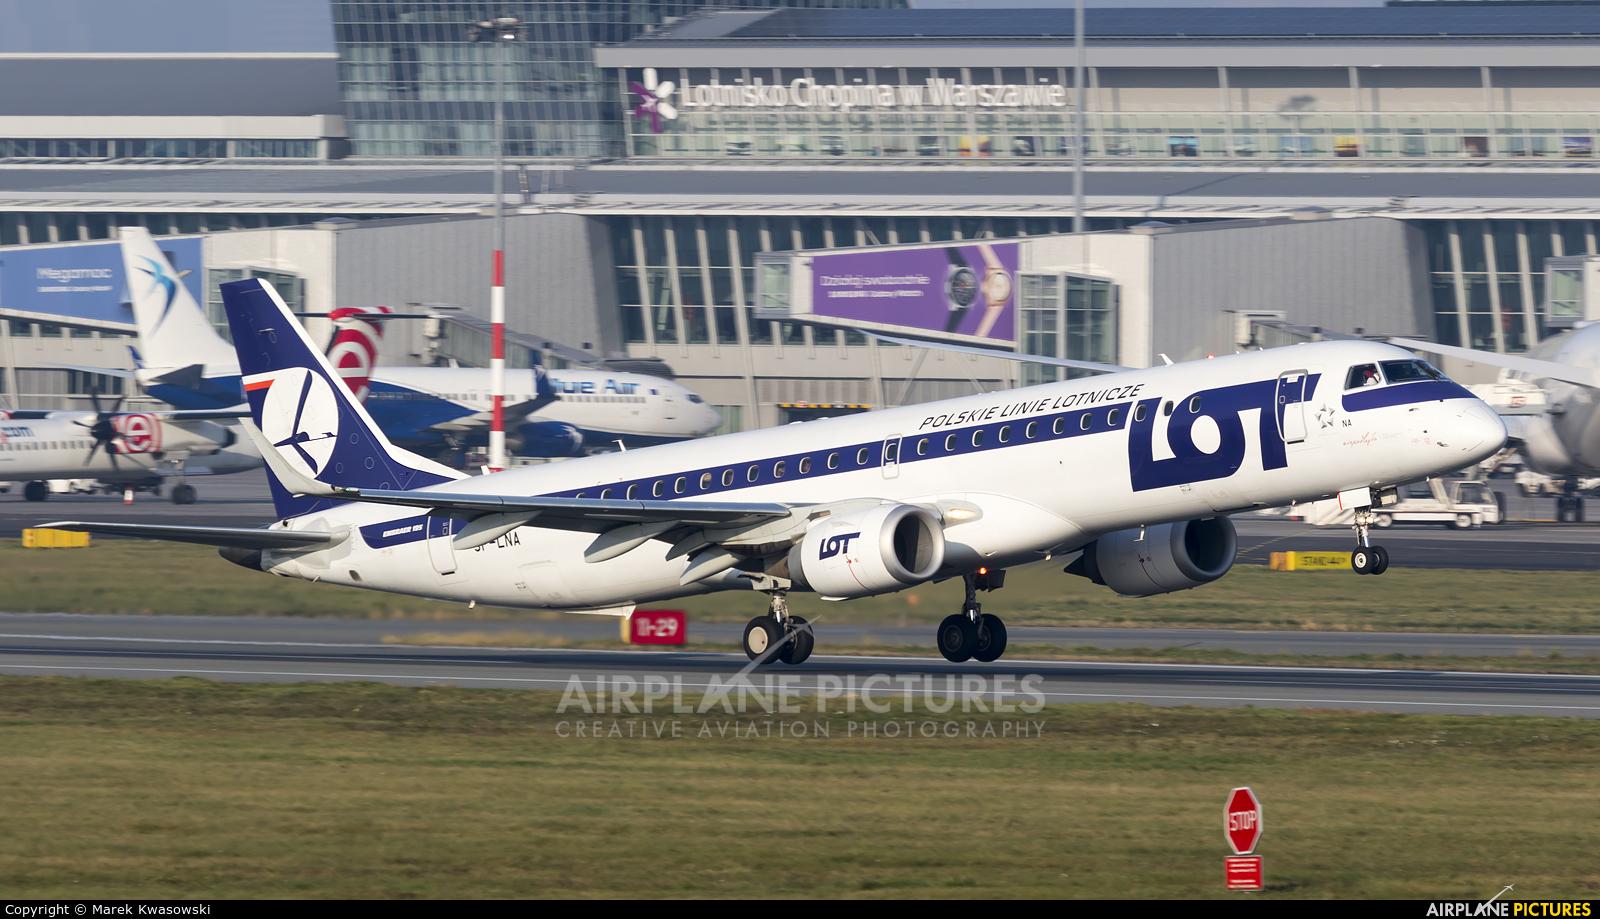 LOT - Polish Airlines SP-LNA aircraft at Warsaw - Frederic Chopin